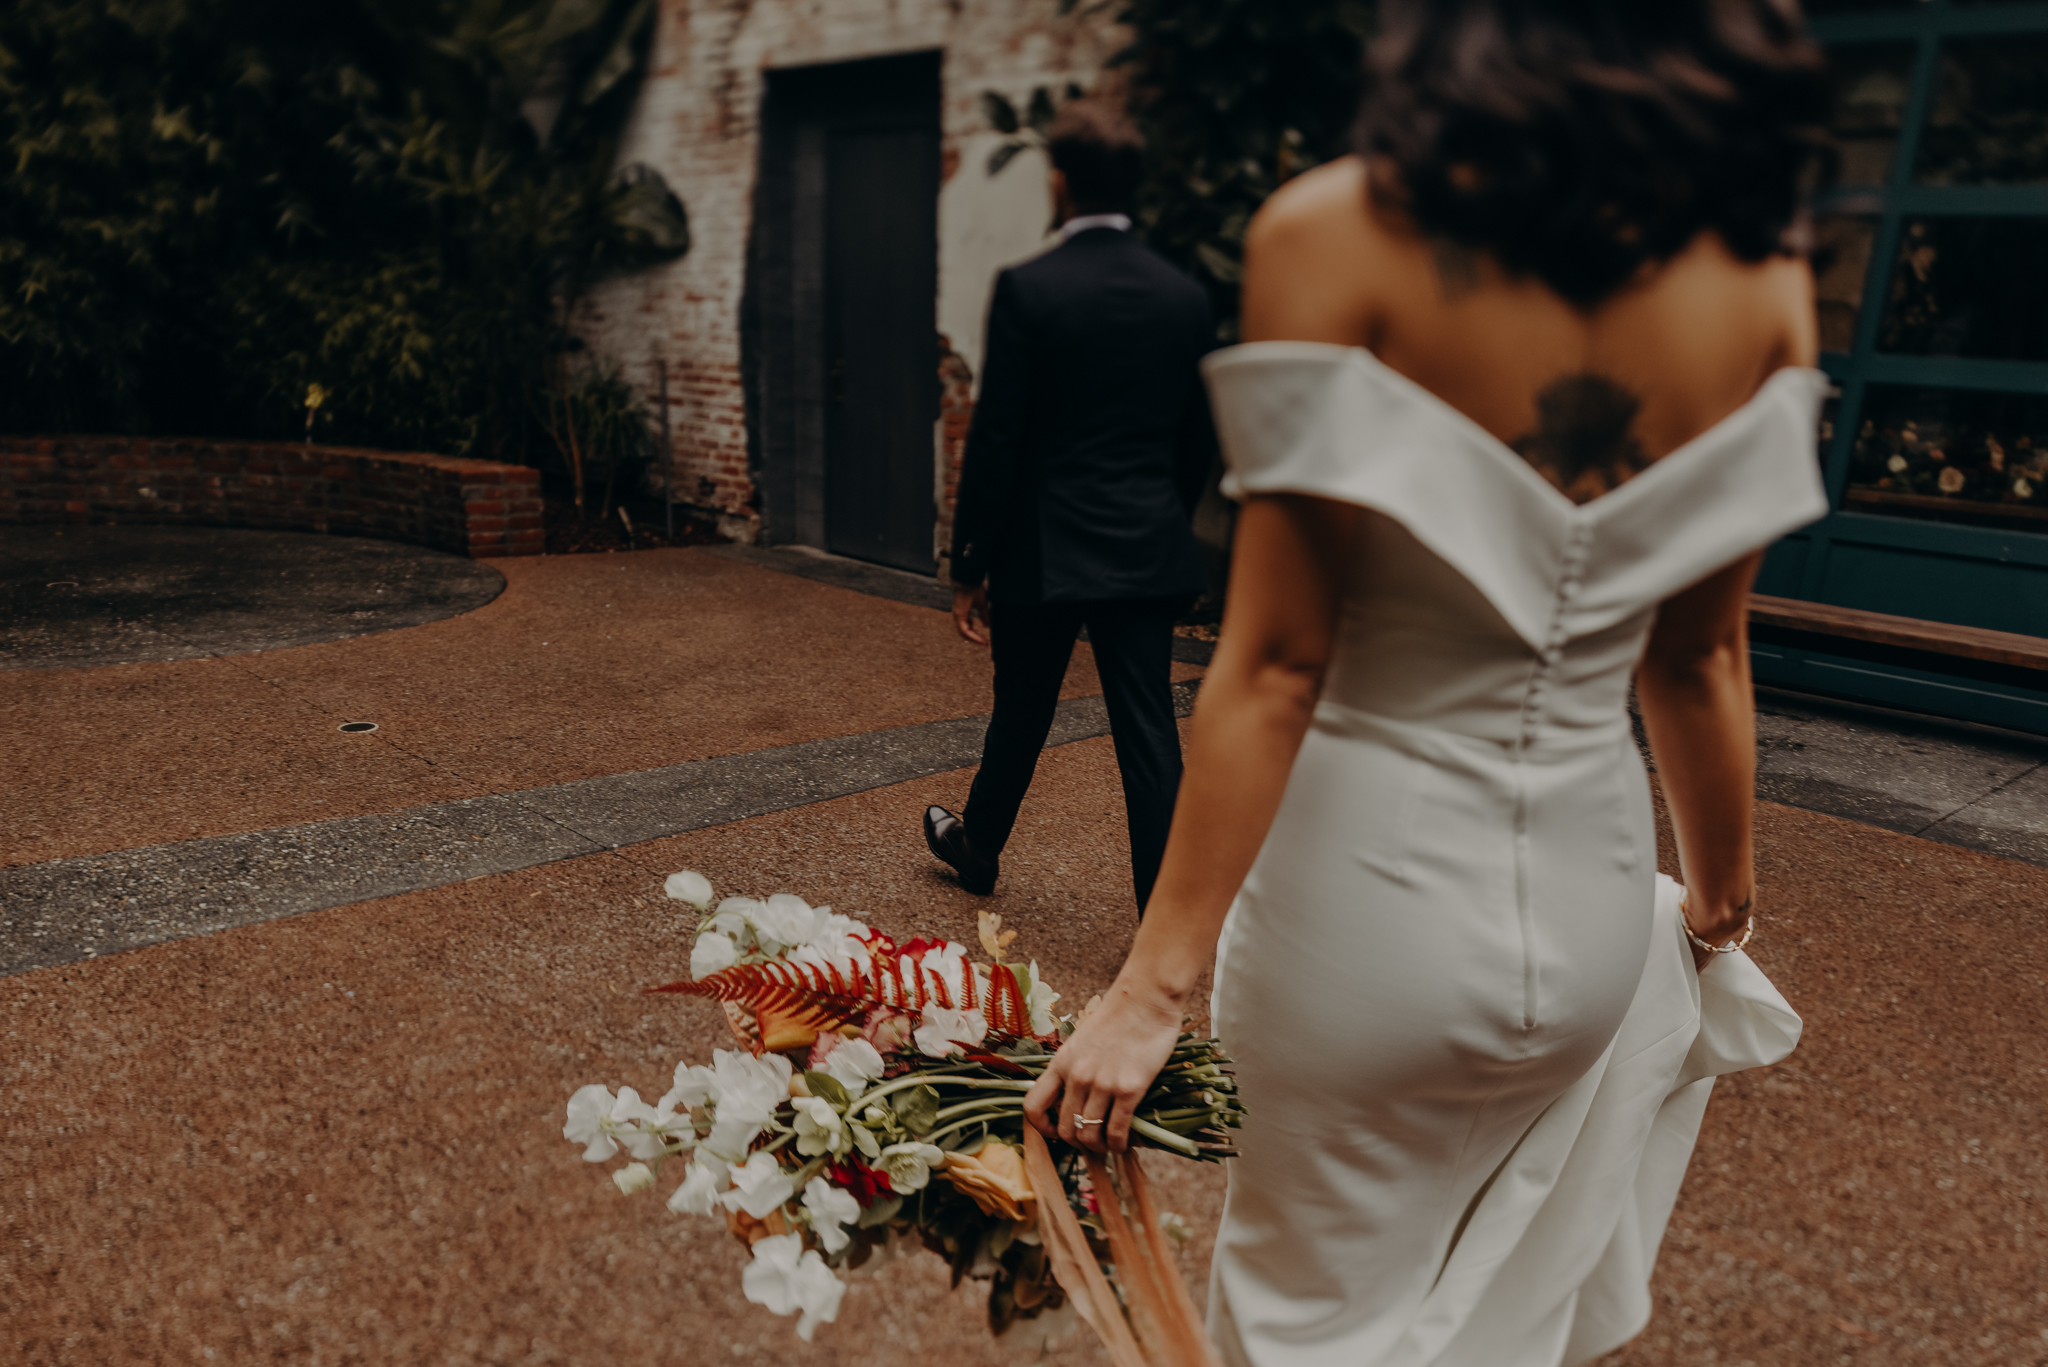 Wedding Photo LA - wedding photographer in los angeles - millwick wedding venue -isaiahandtaylor.com-049.jpg